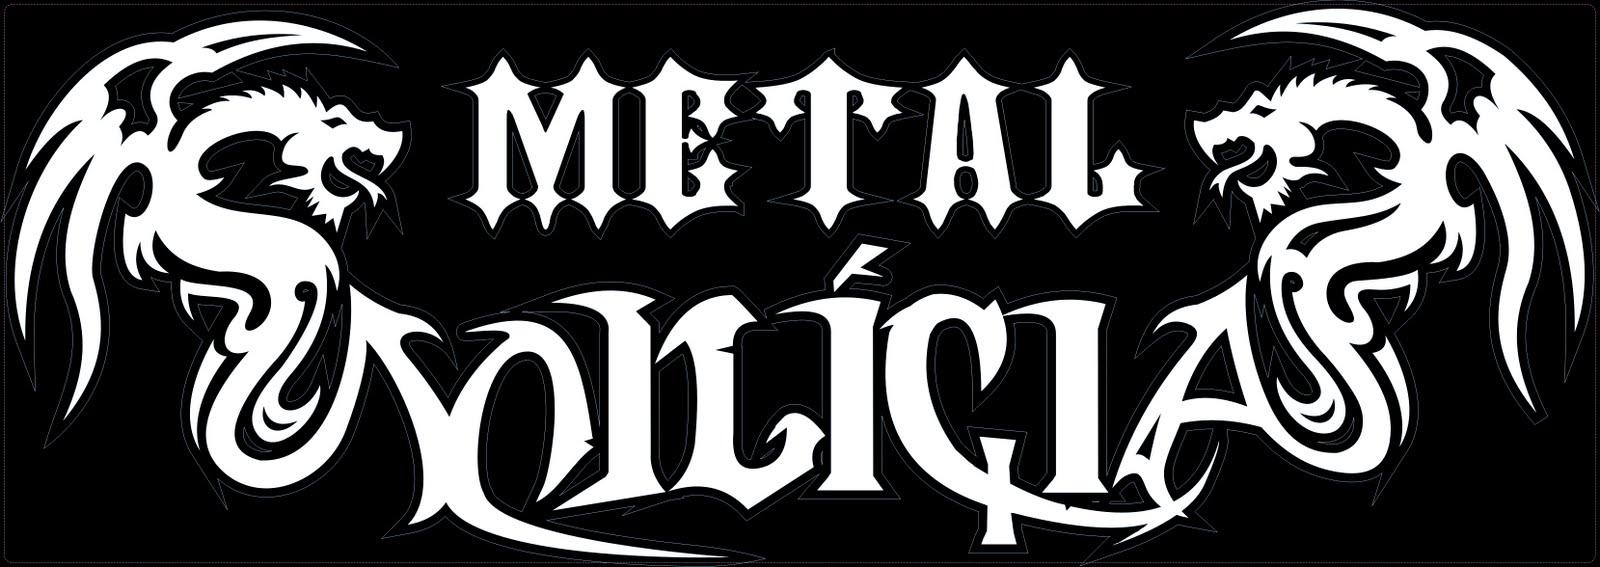 Metal Milicia